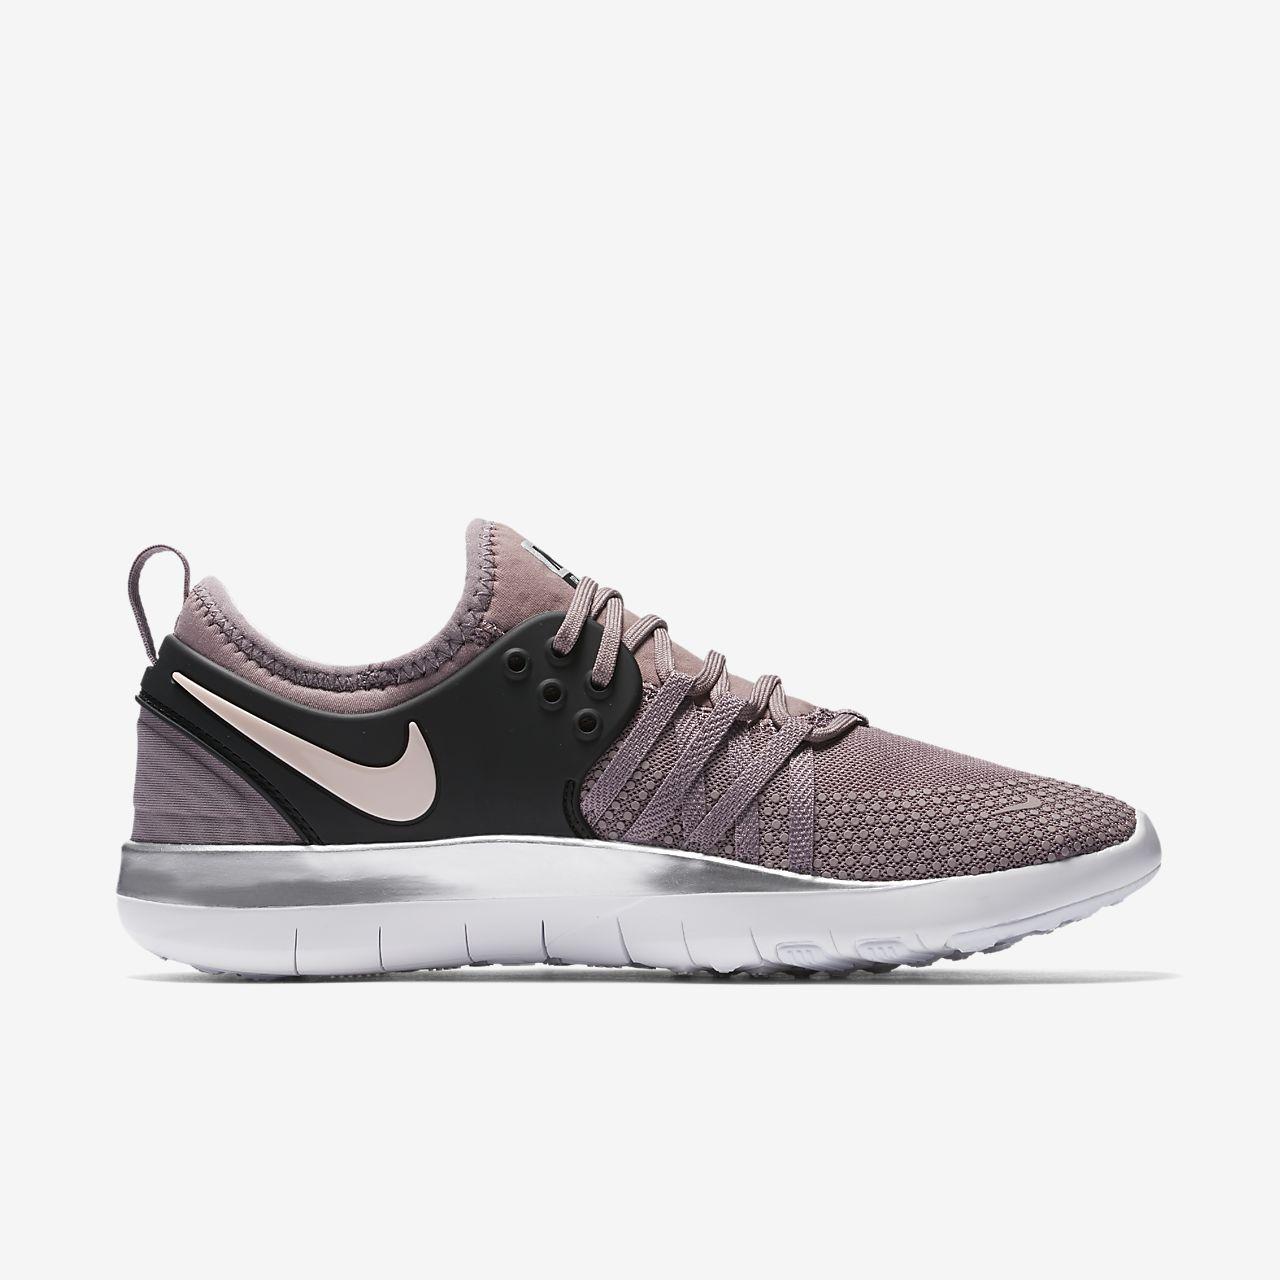 ... Nike Free TR 7 Chrome Blush Women's Training Shoe